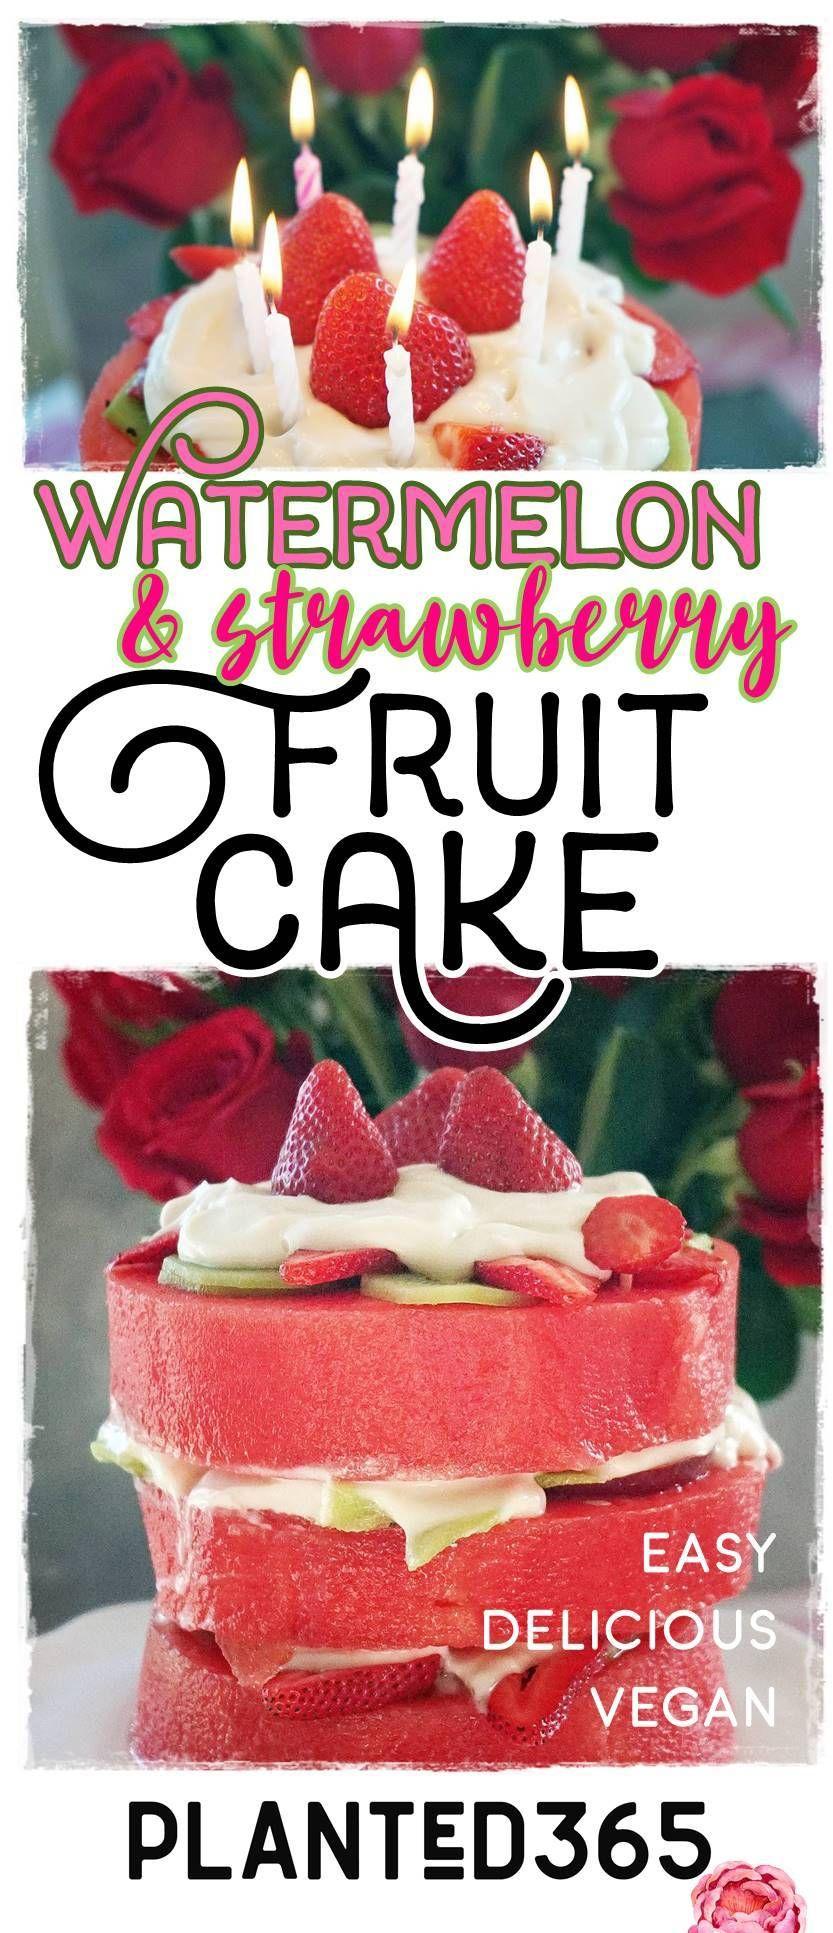 Watermelon Fruit Cake Vegan Gluten Free Planted365 Recipe In 2020 Fruit Cake Watermelon Dessert Recipes Fruit Recipes